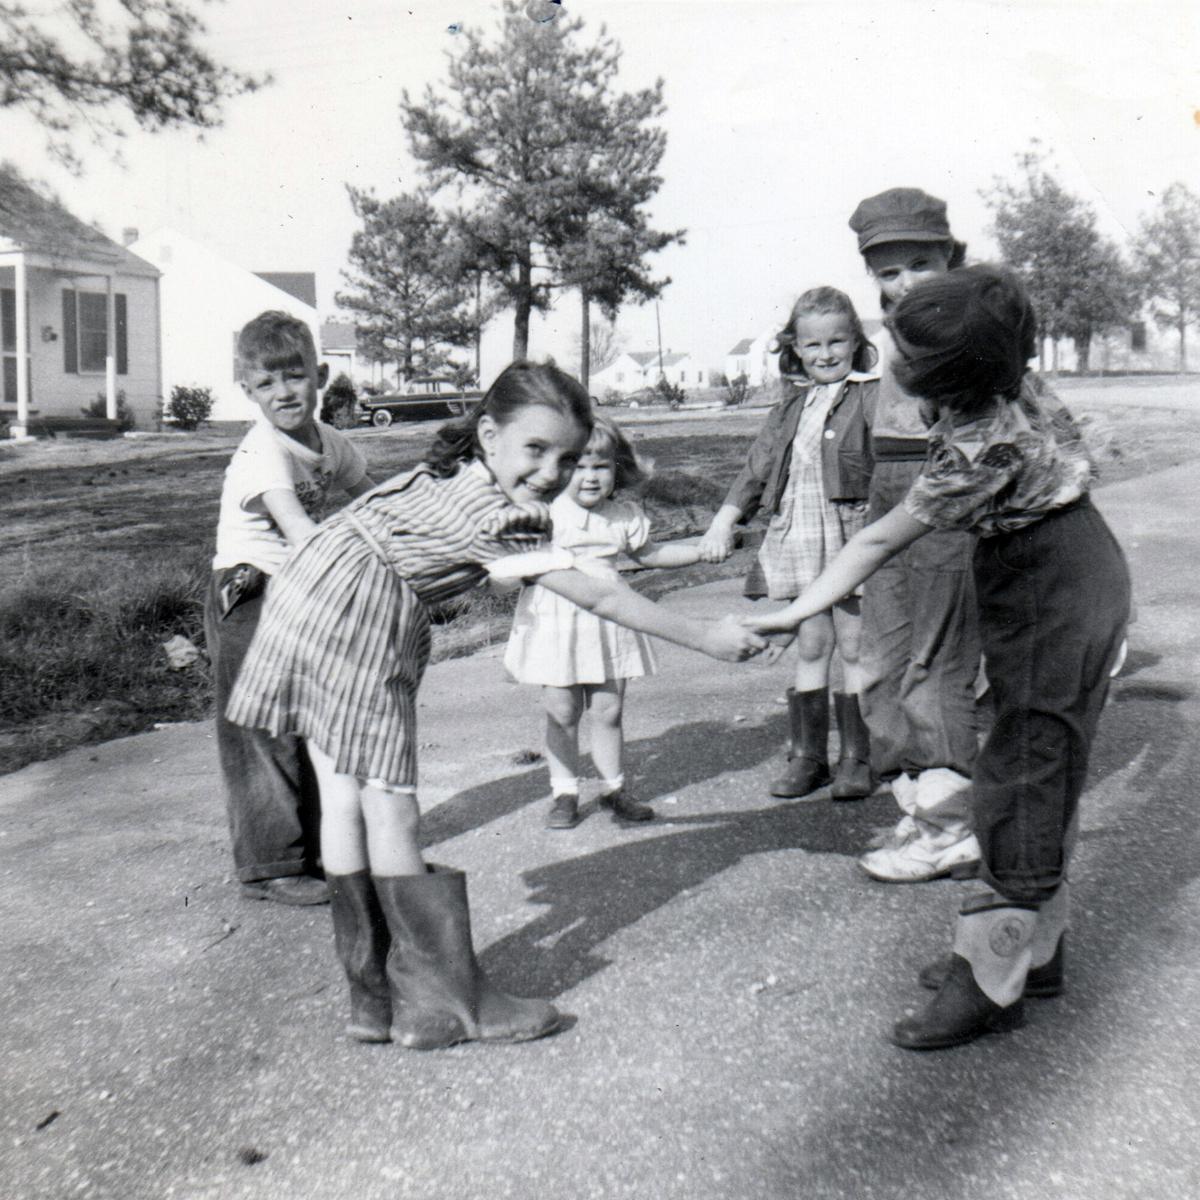 Vale and Plainview Avenue, 1954